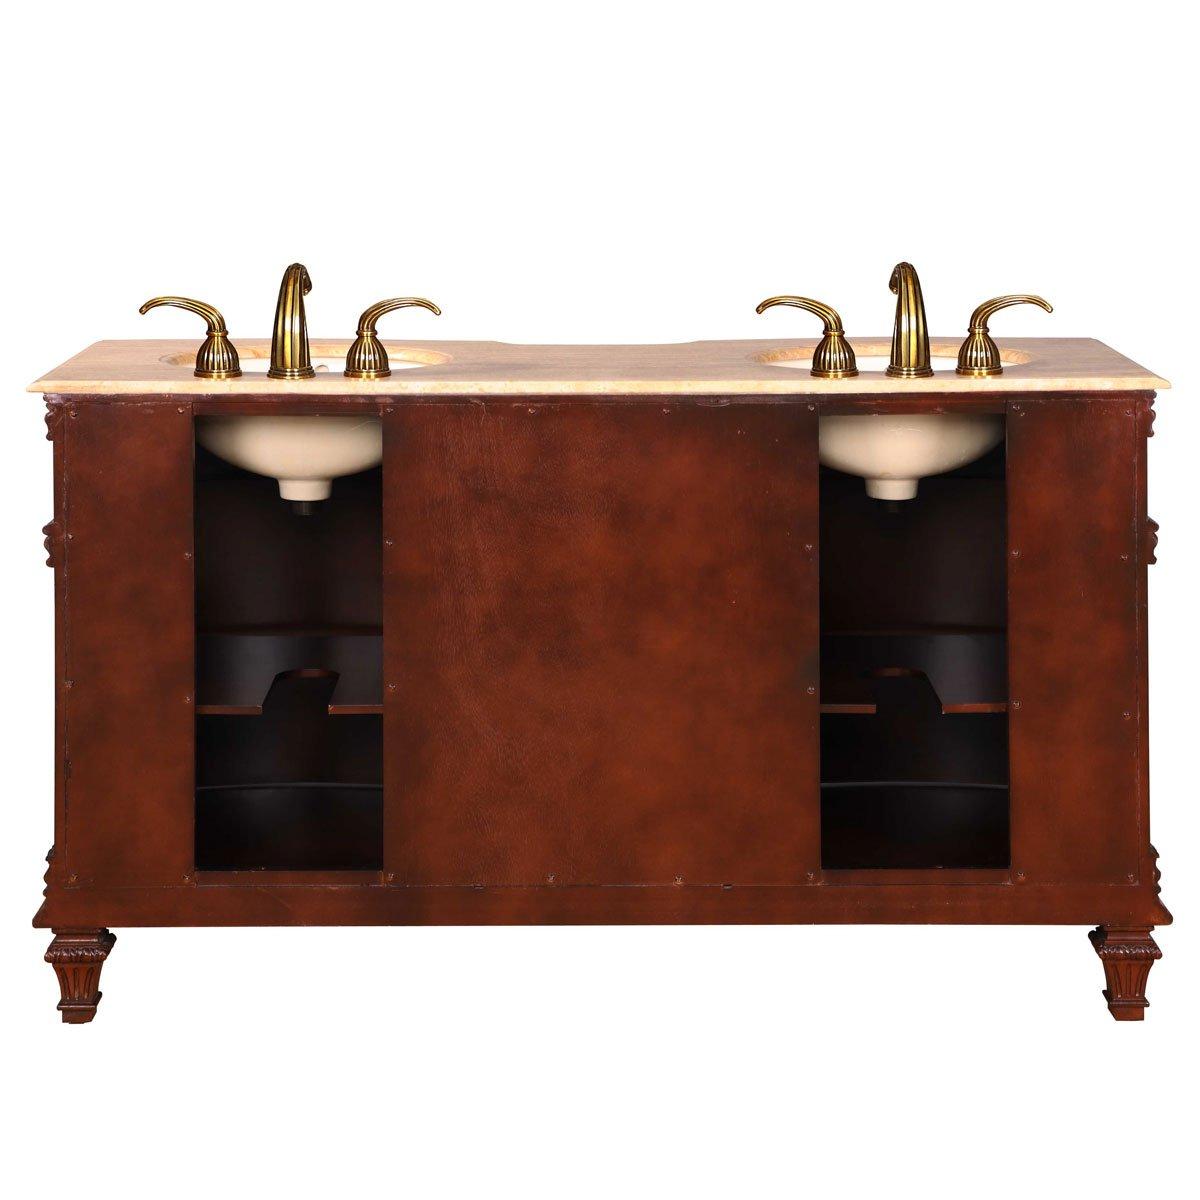 Amazon.com: Silkroad Exclusive Travertine Stone Top Double Sink Bathroom  Vanity With Cabinet, 60 Inch: Home U0026 Kitchen